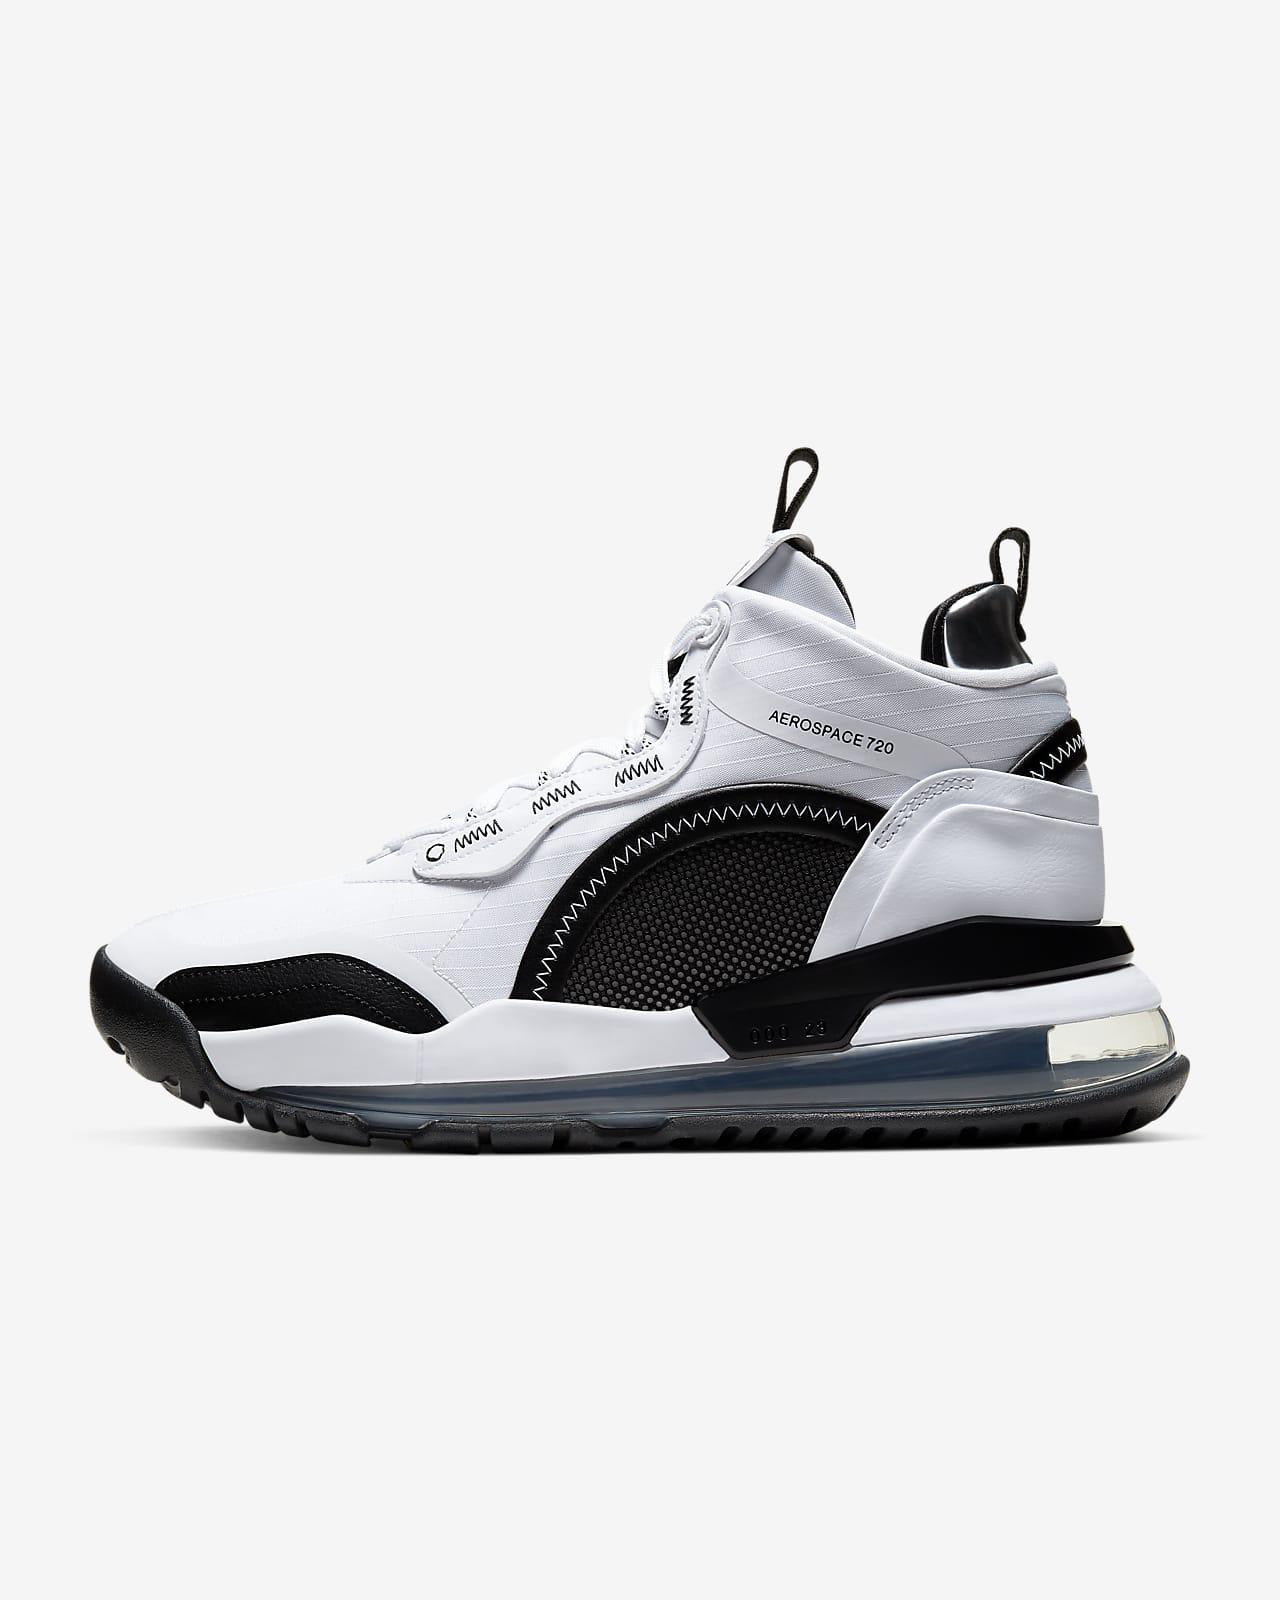 Distinguir creativo Dominante  Calzado para hombre Jordan Aerospace 720. Nike.com